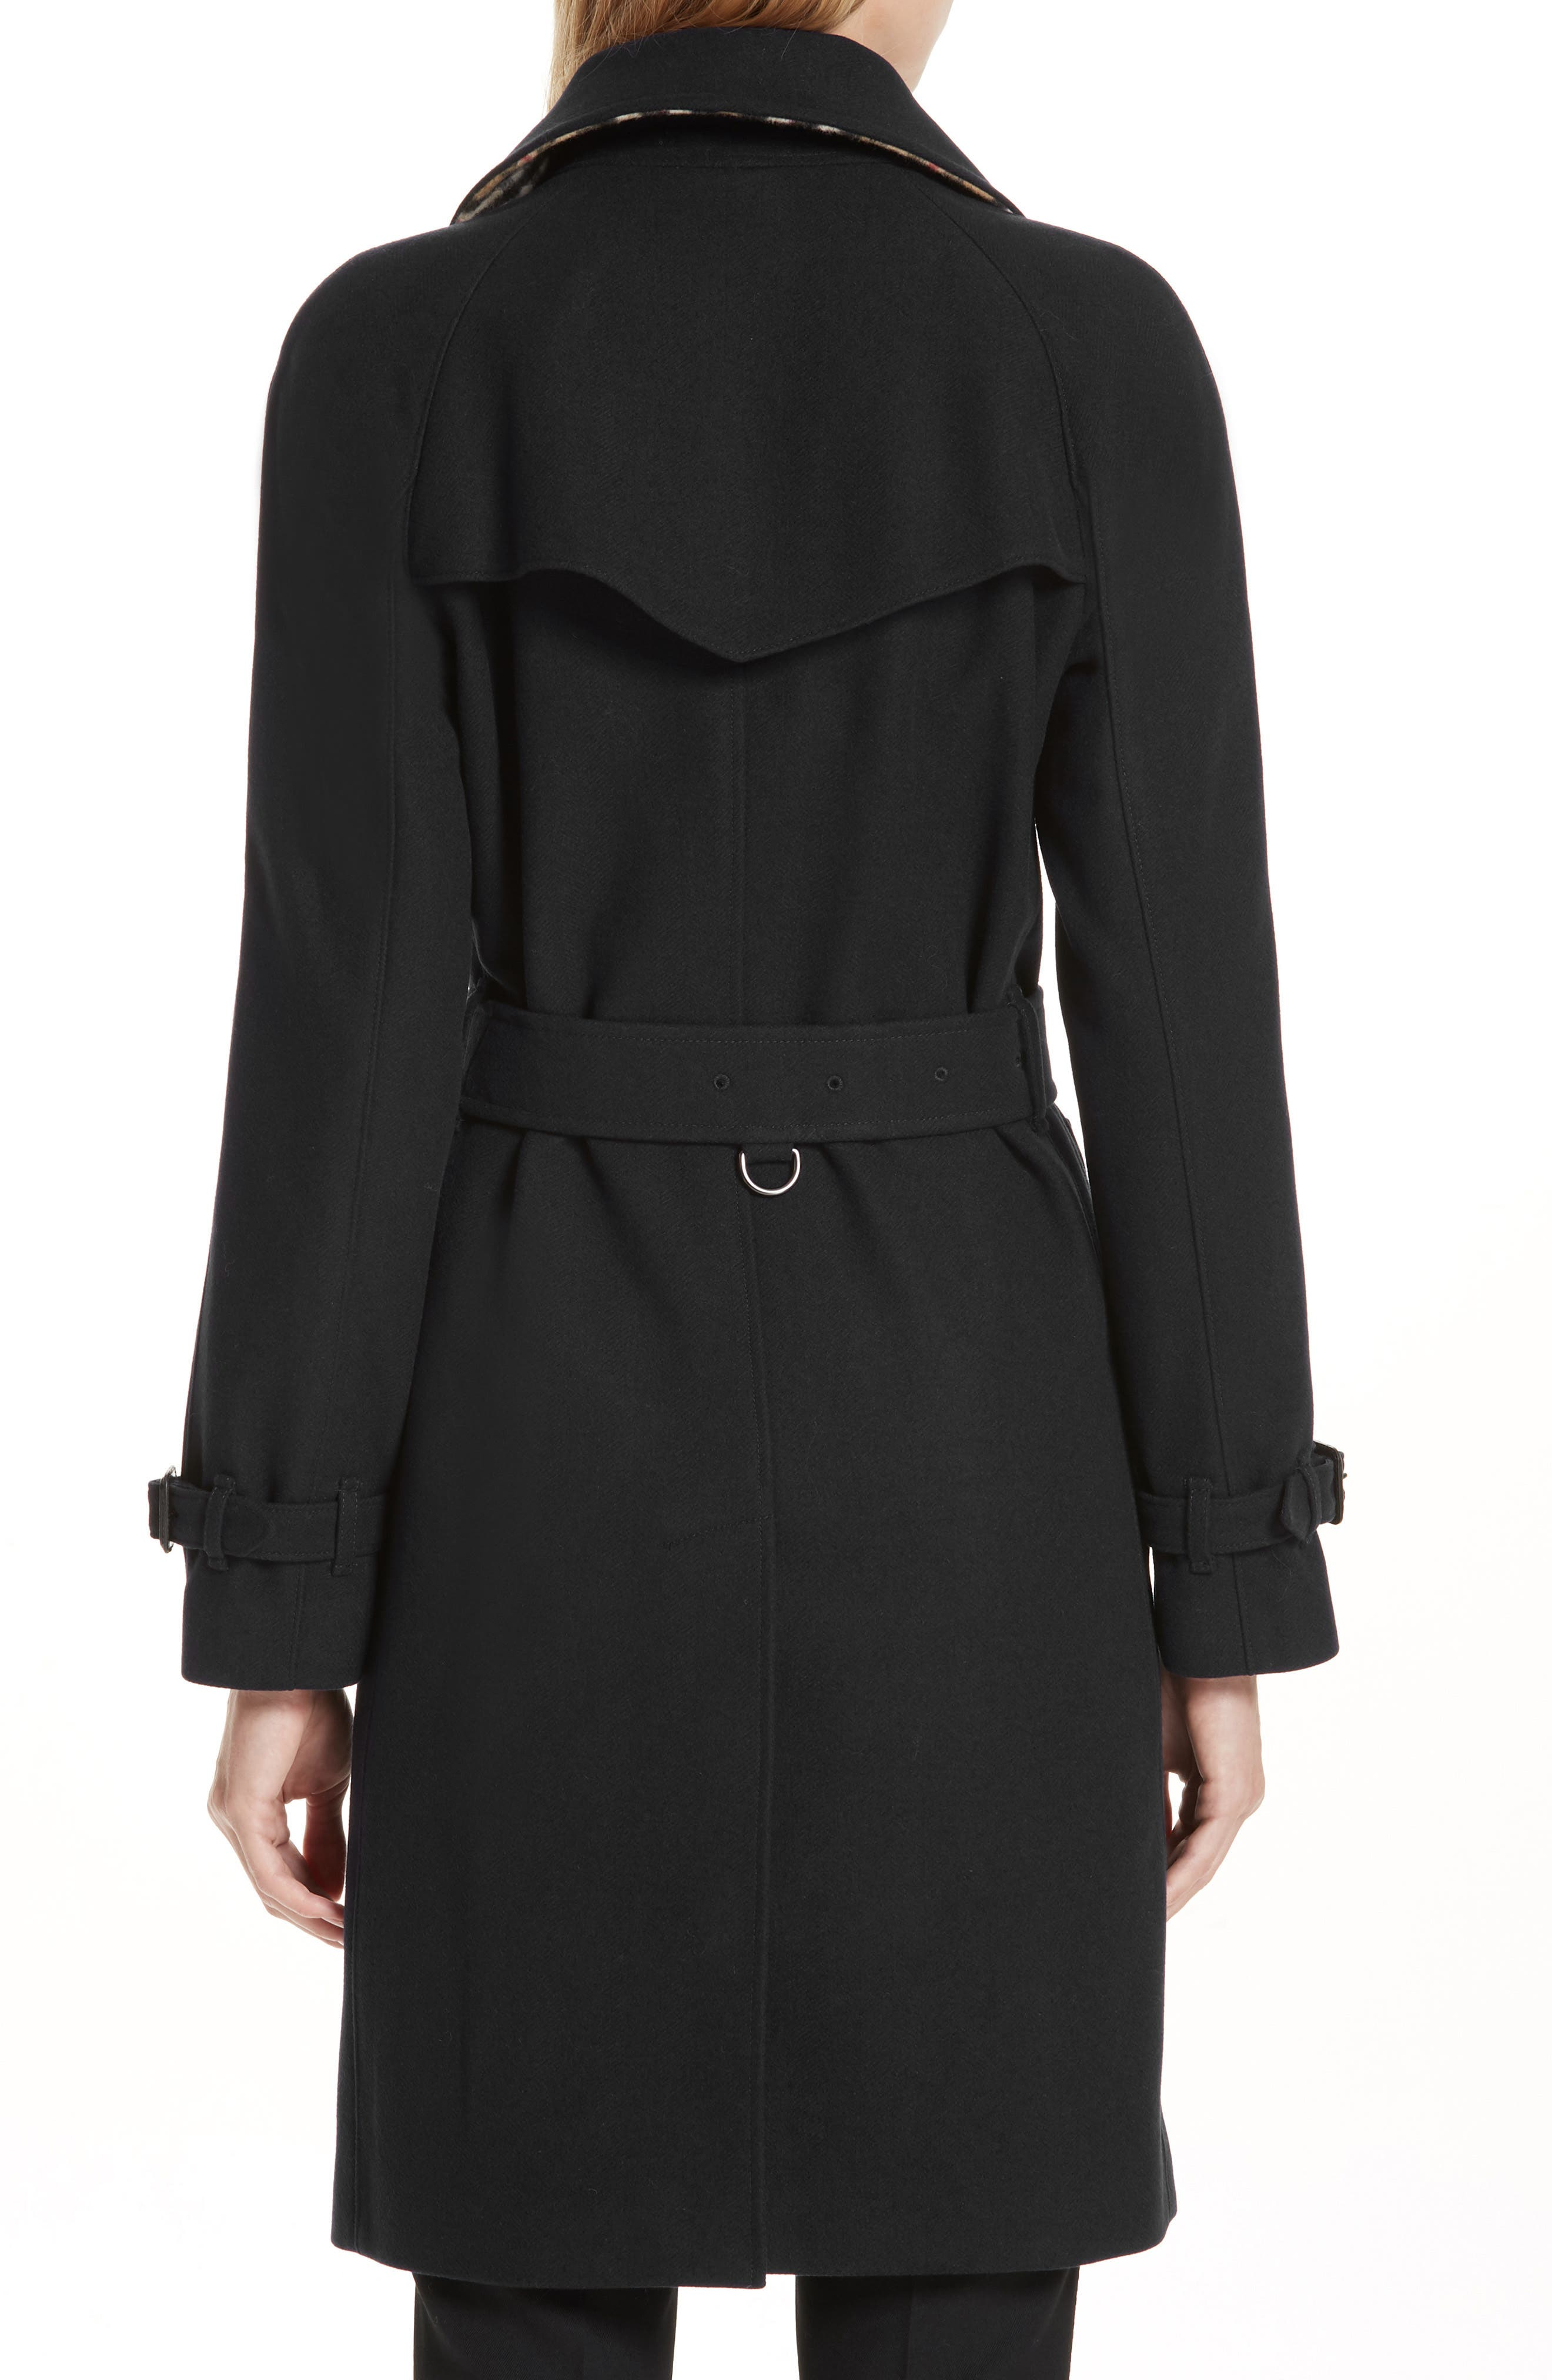 Cranston Wool Blend Trench Coat,                             Alternate thumbnail 2, color,                             BLACK